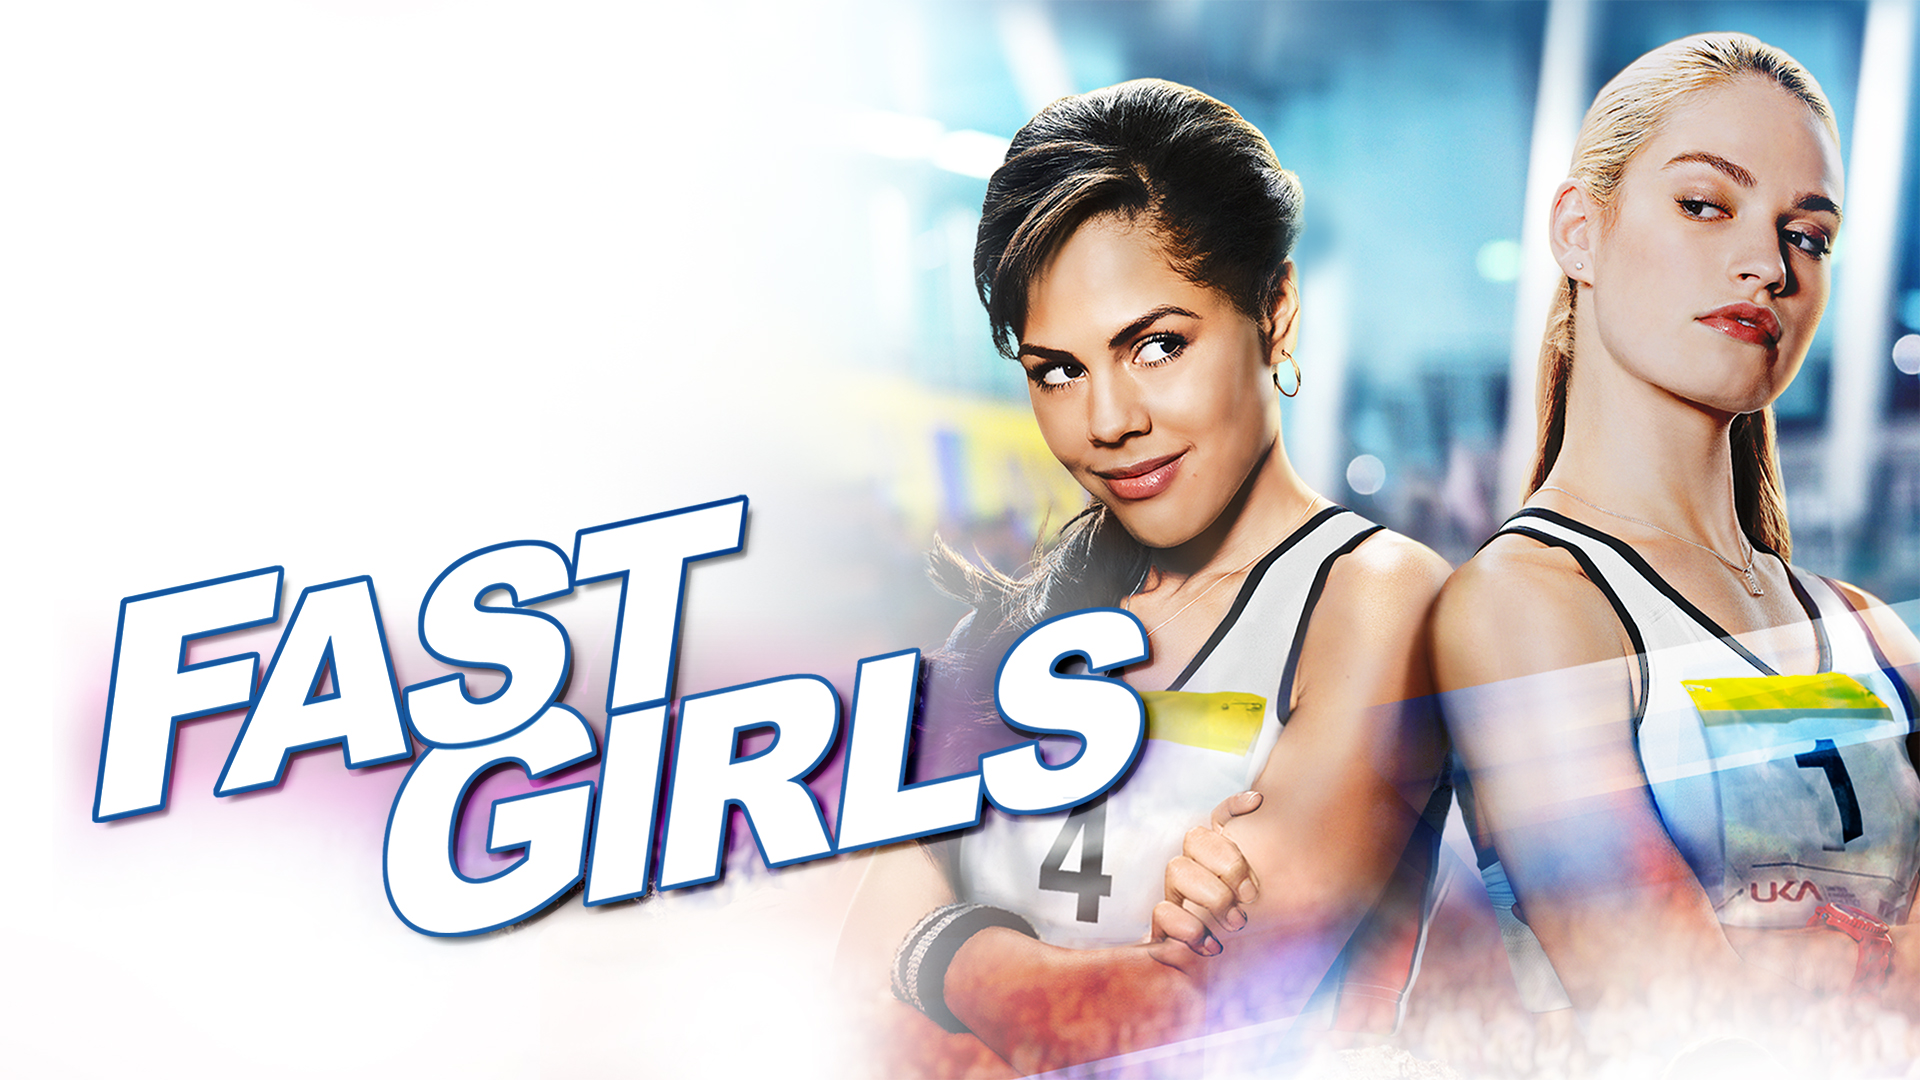 Fast Girls - International category image